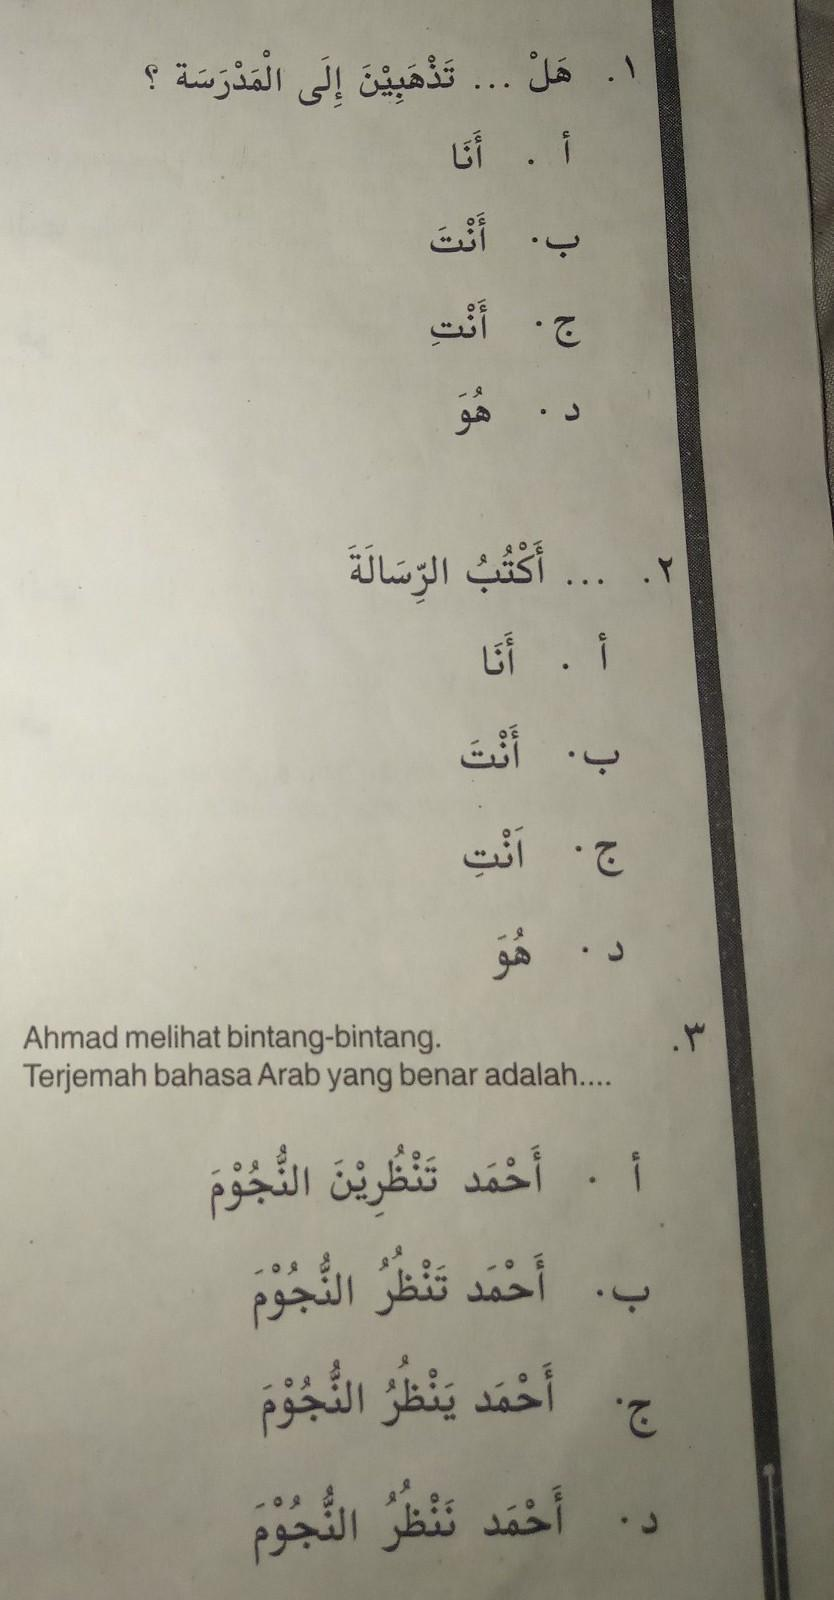 Kunci Jawaban Bahasa Arab Mts Kelas 7 Semester 2 Kurikulum K13 Halaman 58 Nomer 1 30 Saja Pliss Brainly Co Id